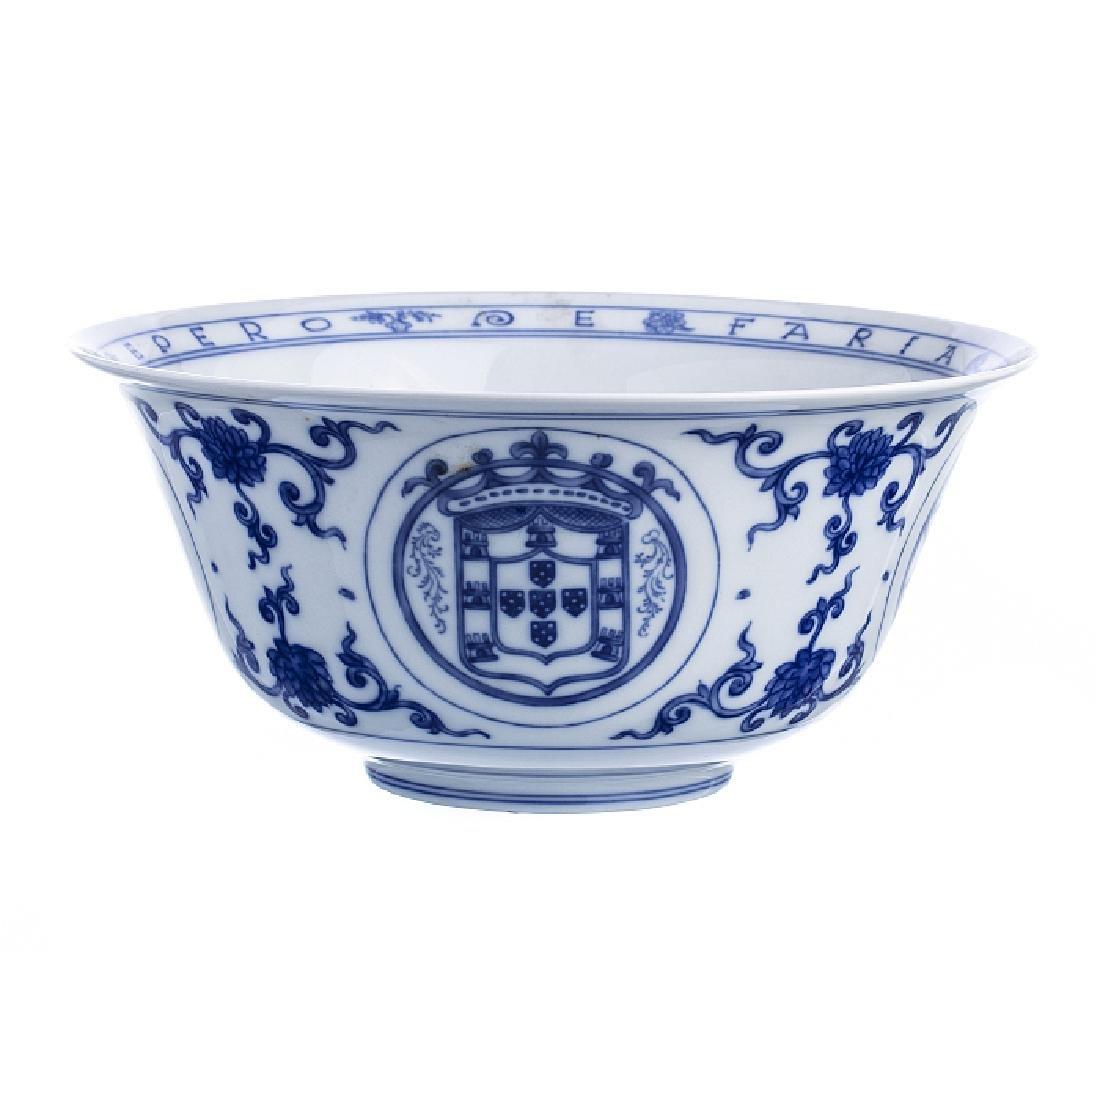 Pedro de Faria' bowl by Vista Alegre